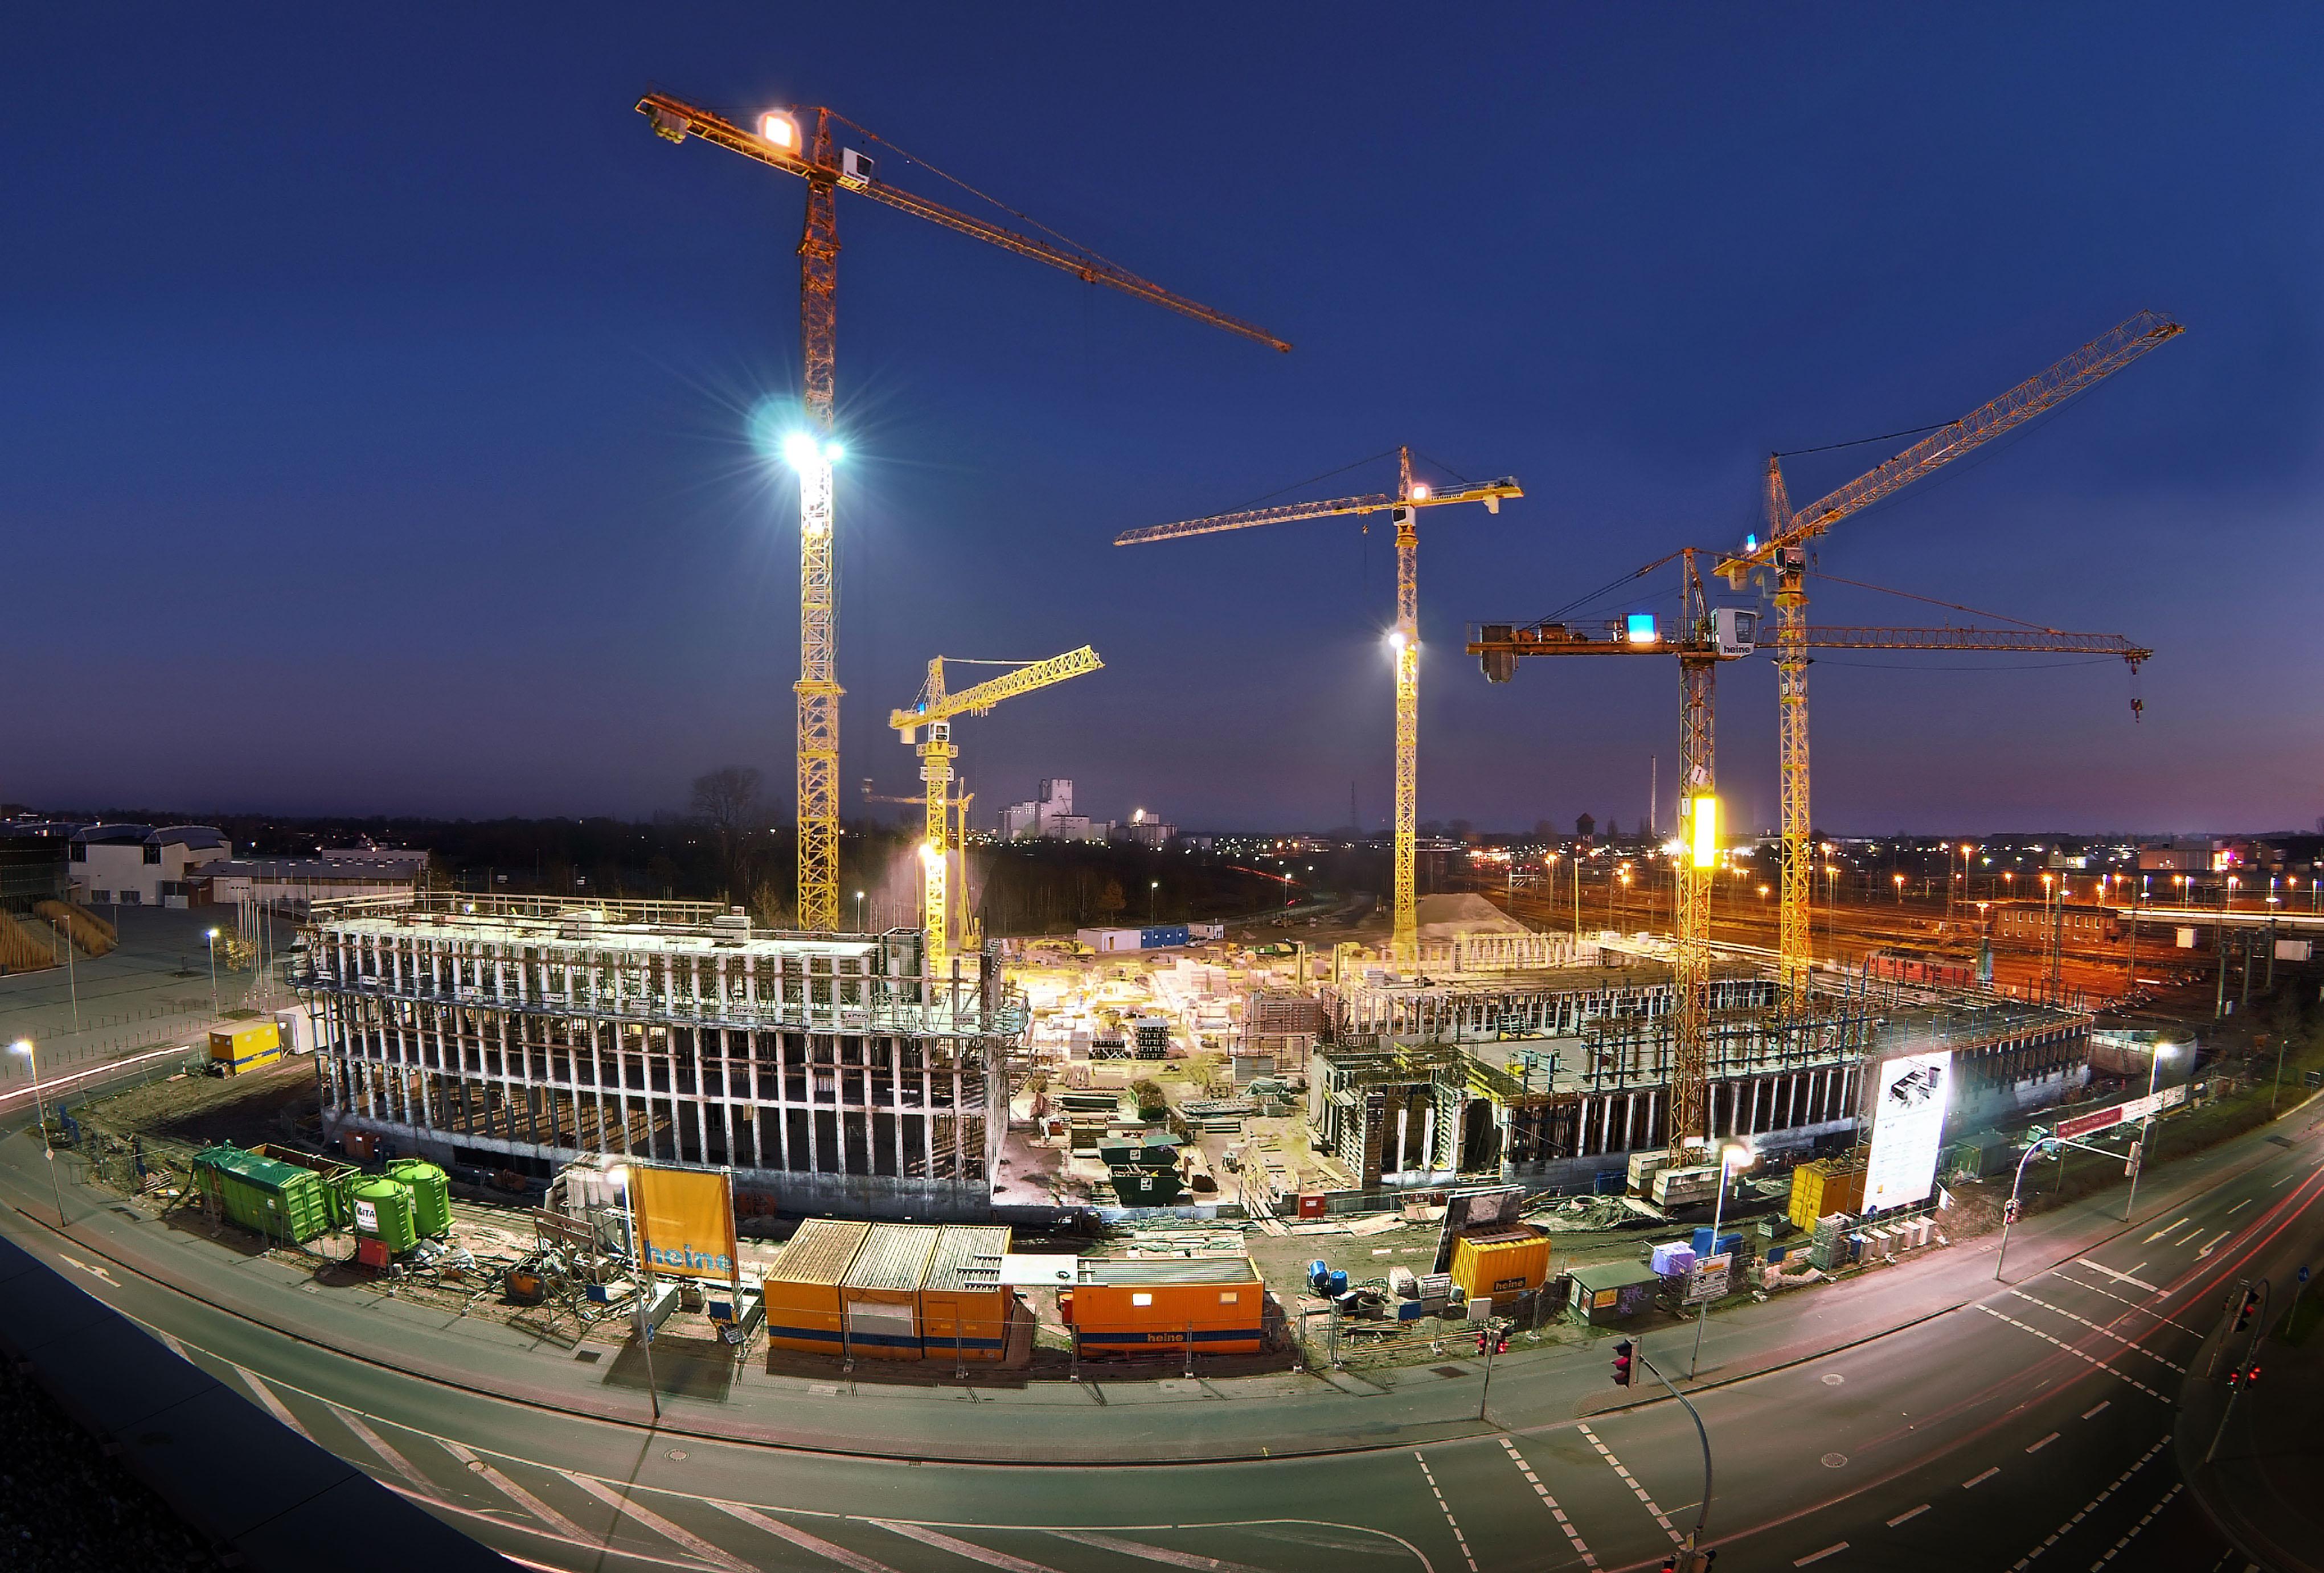 LzO Baustelle Nacht1 neu.jpg